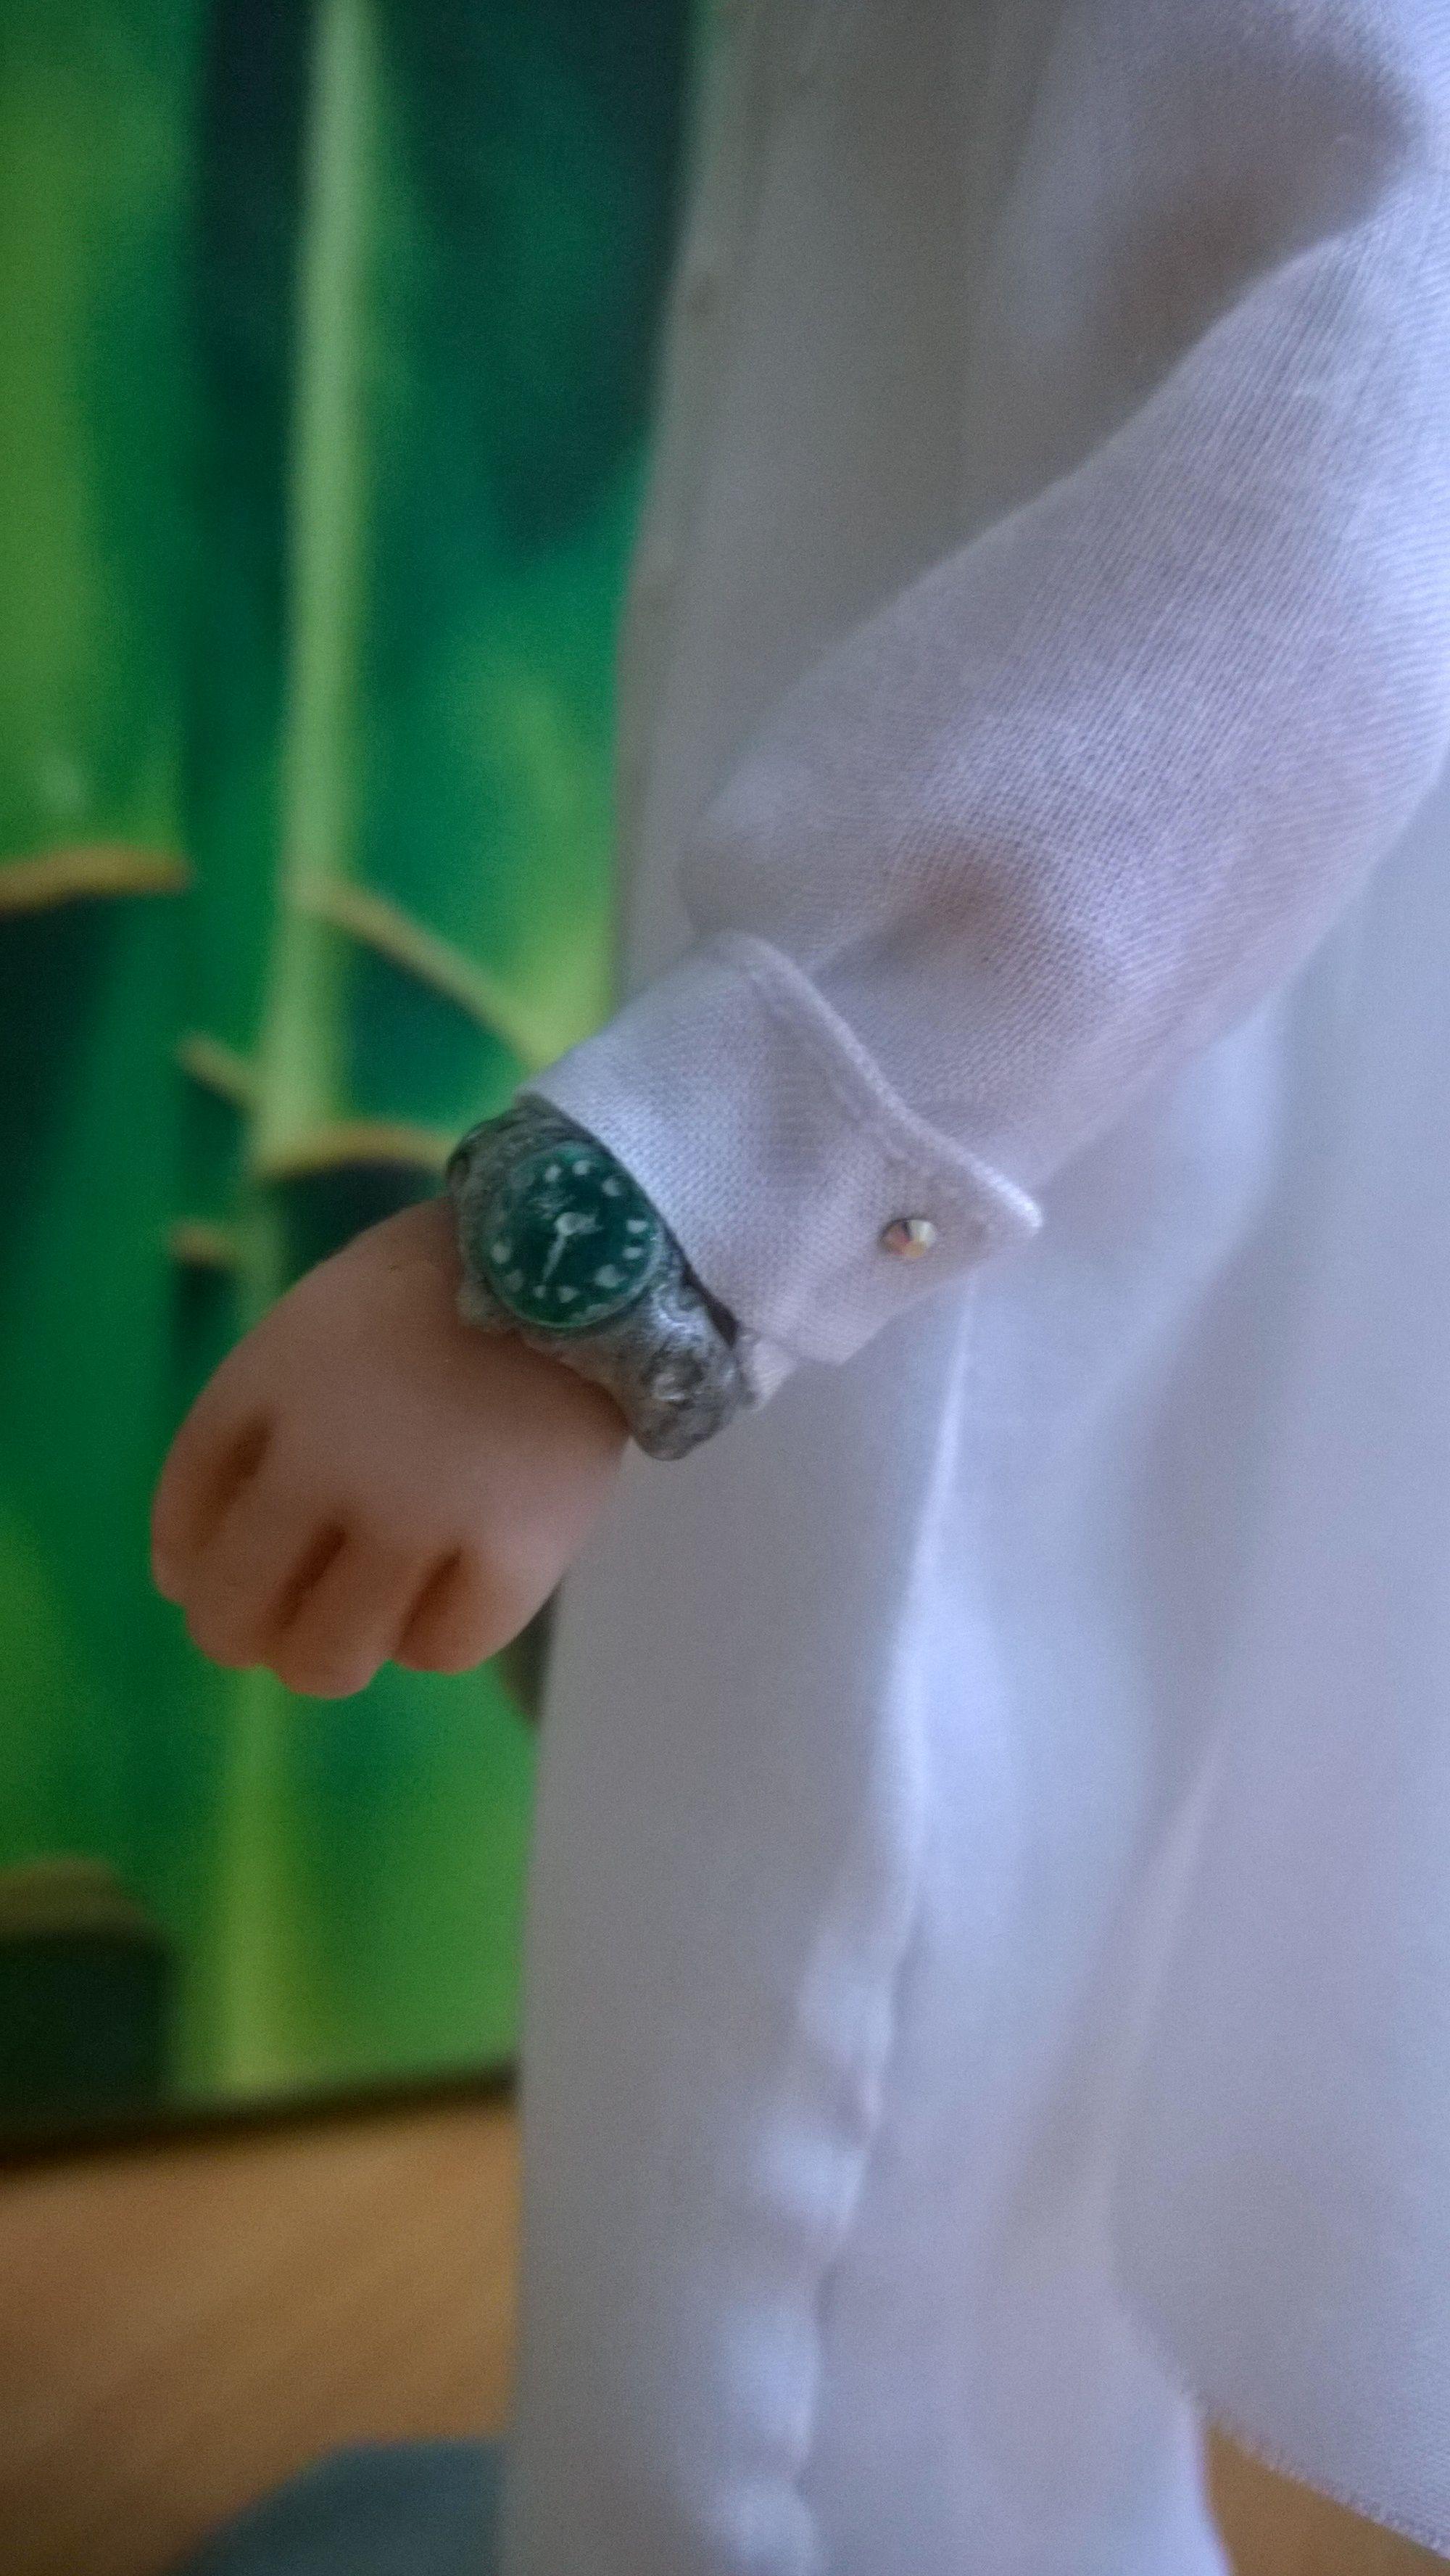 мужчина подарок кукла богатство араб авторская мечта